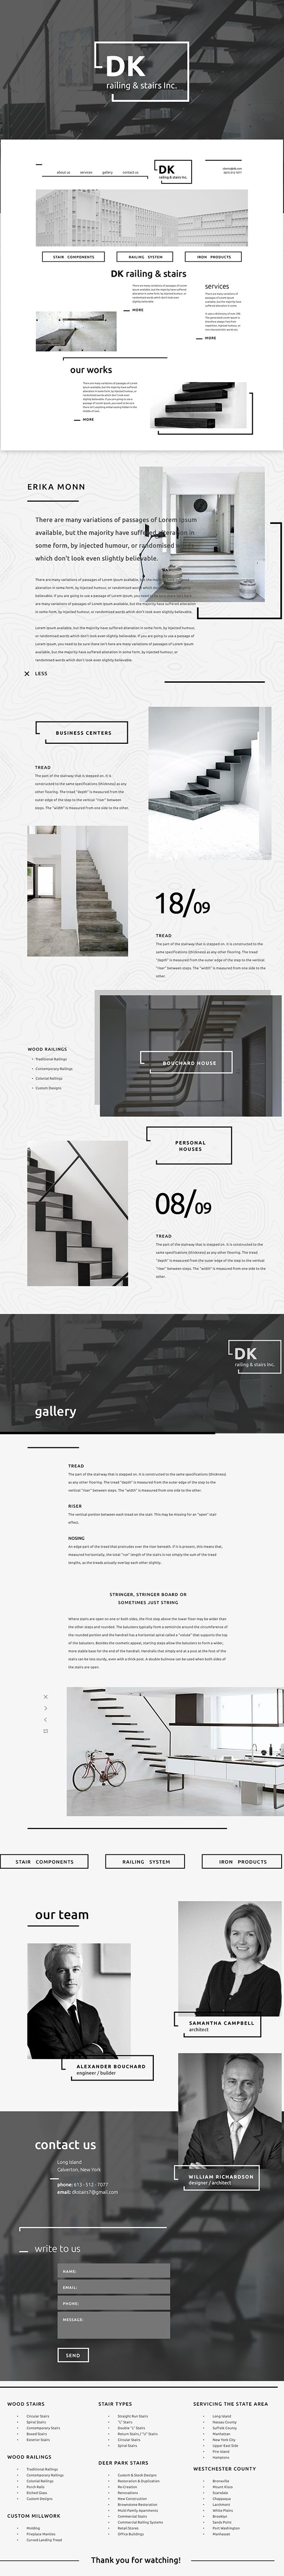 DK // railing & stairs Inc. on Behance